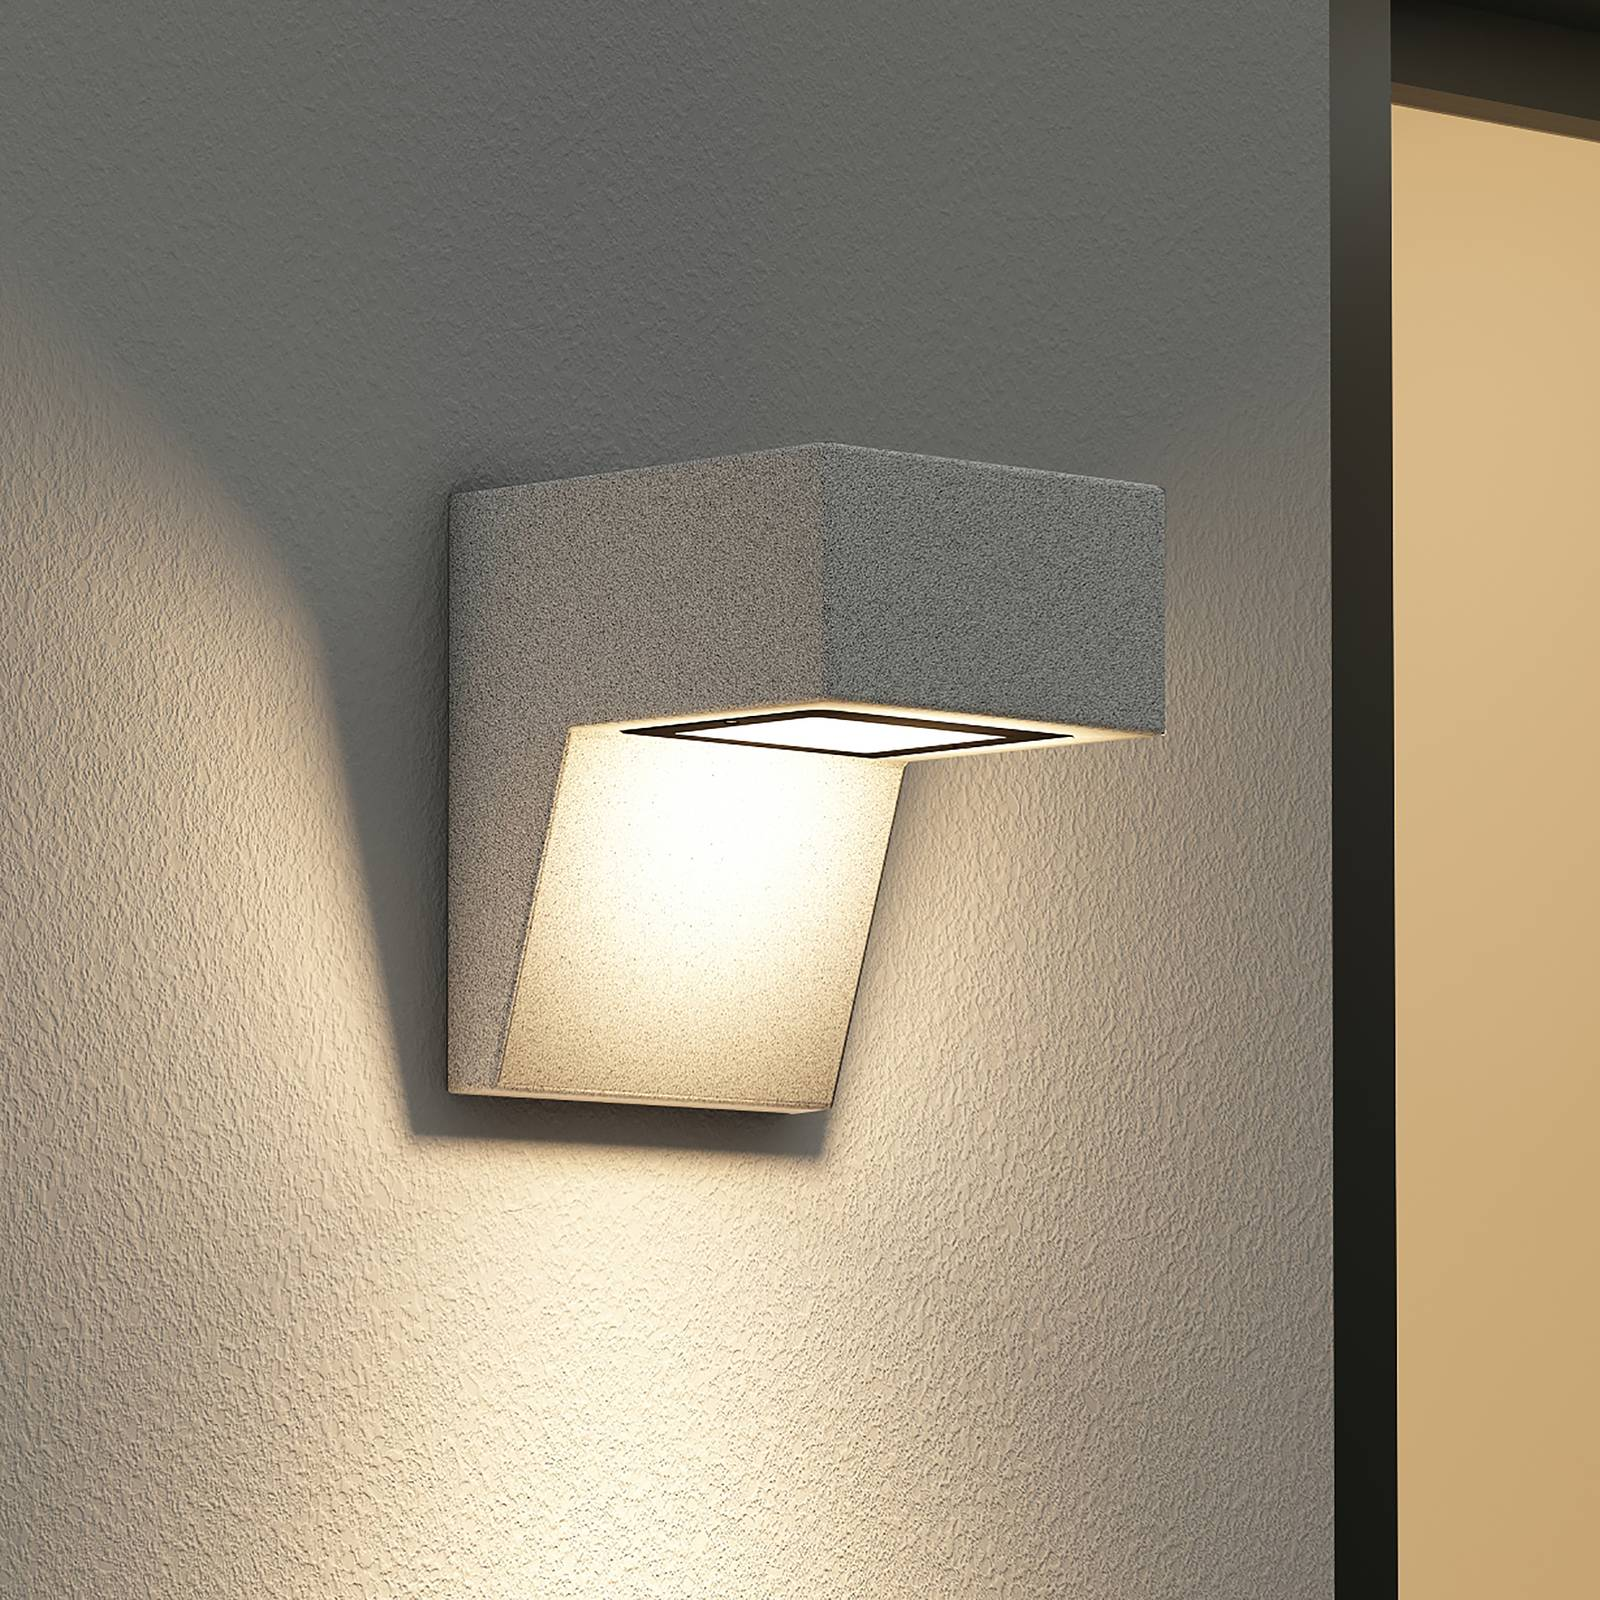 Arcchio -LED-ulkoseinälamppu Udonna pidin alhaalla